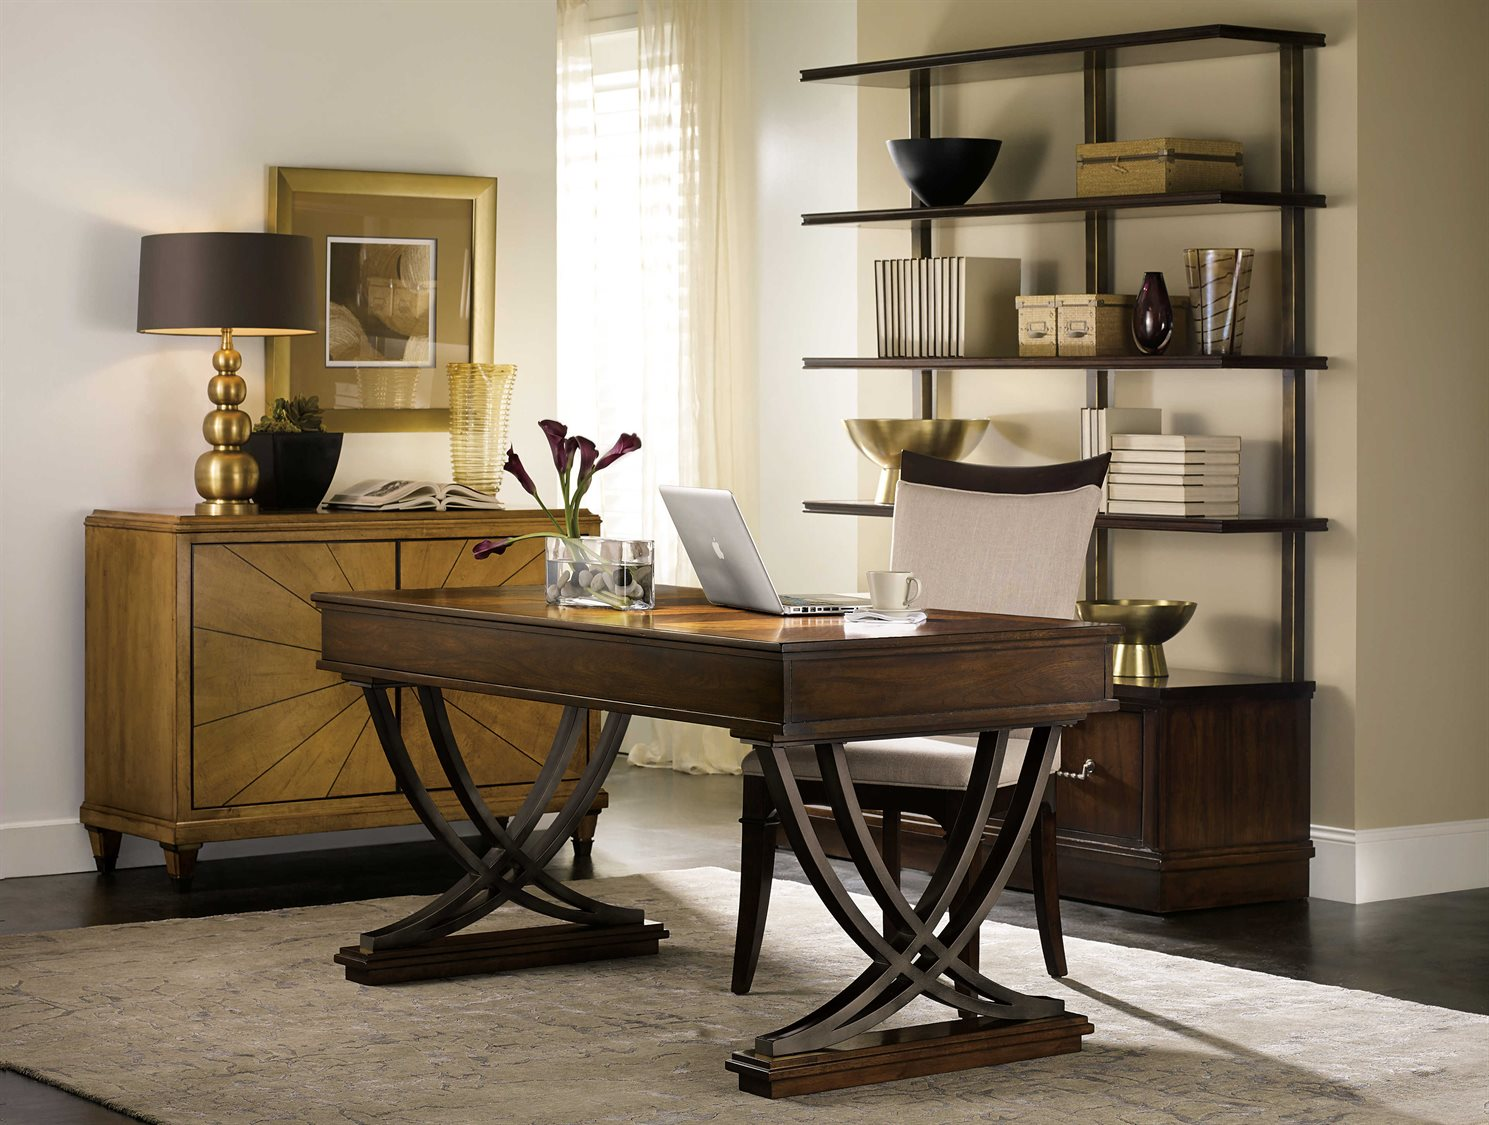 newport com dark amazon desk dp kitchen dining convenience laurel wood espresso concepts